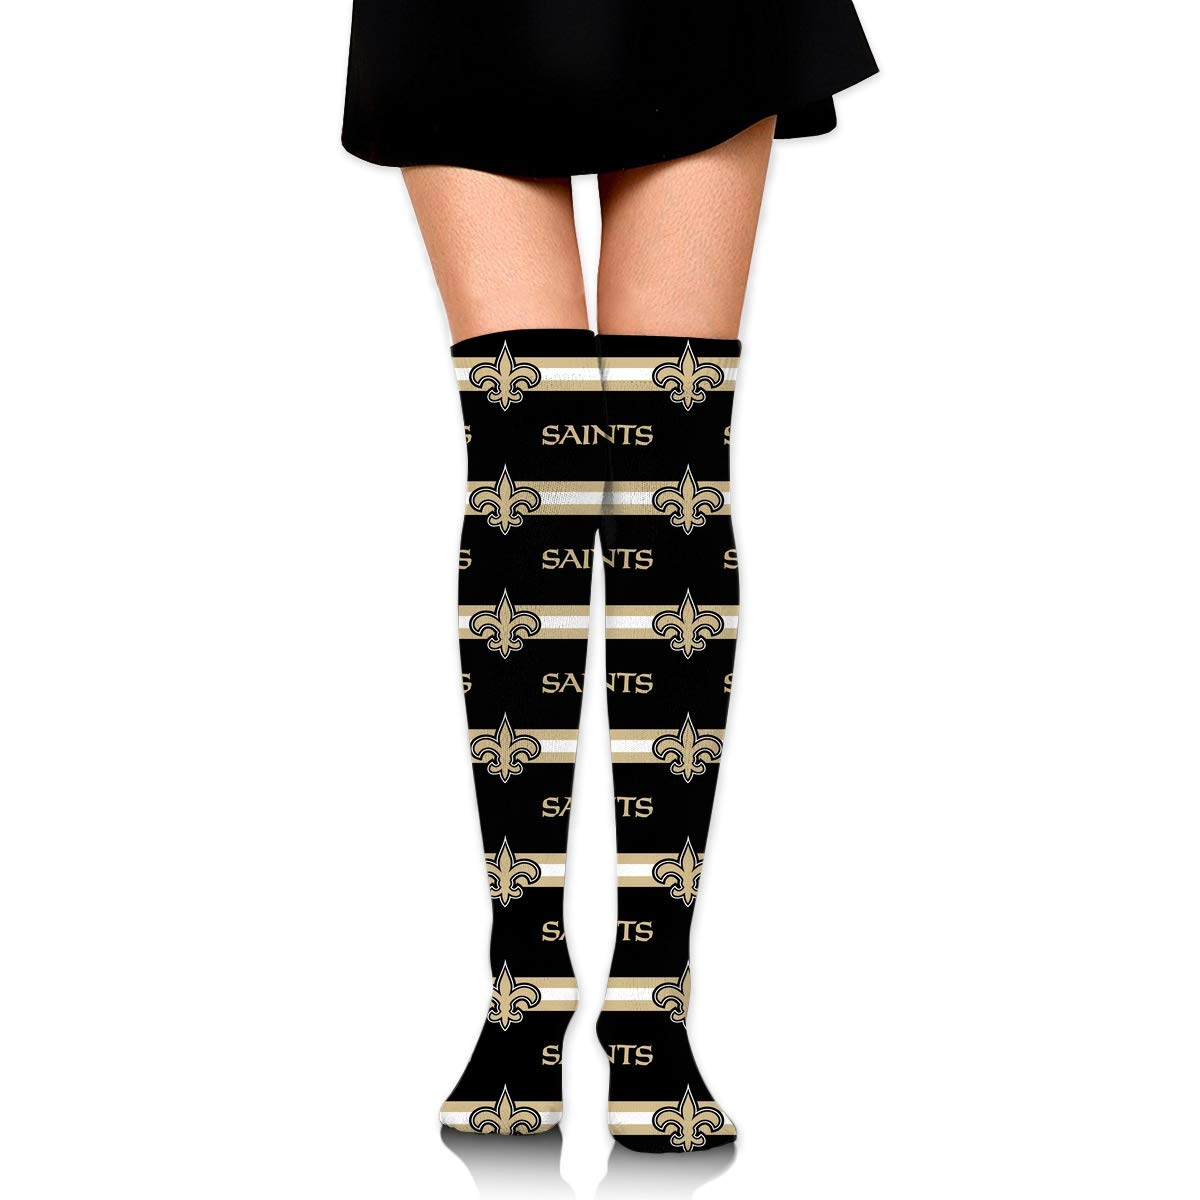 Sorcerer Custom Girls Over Knee High Boot Stockings Leg Warmers New Orleans Saints Women's Polyester Thigh High Socks Gift by Sorcerer